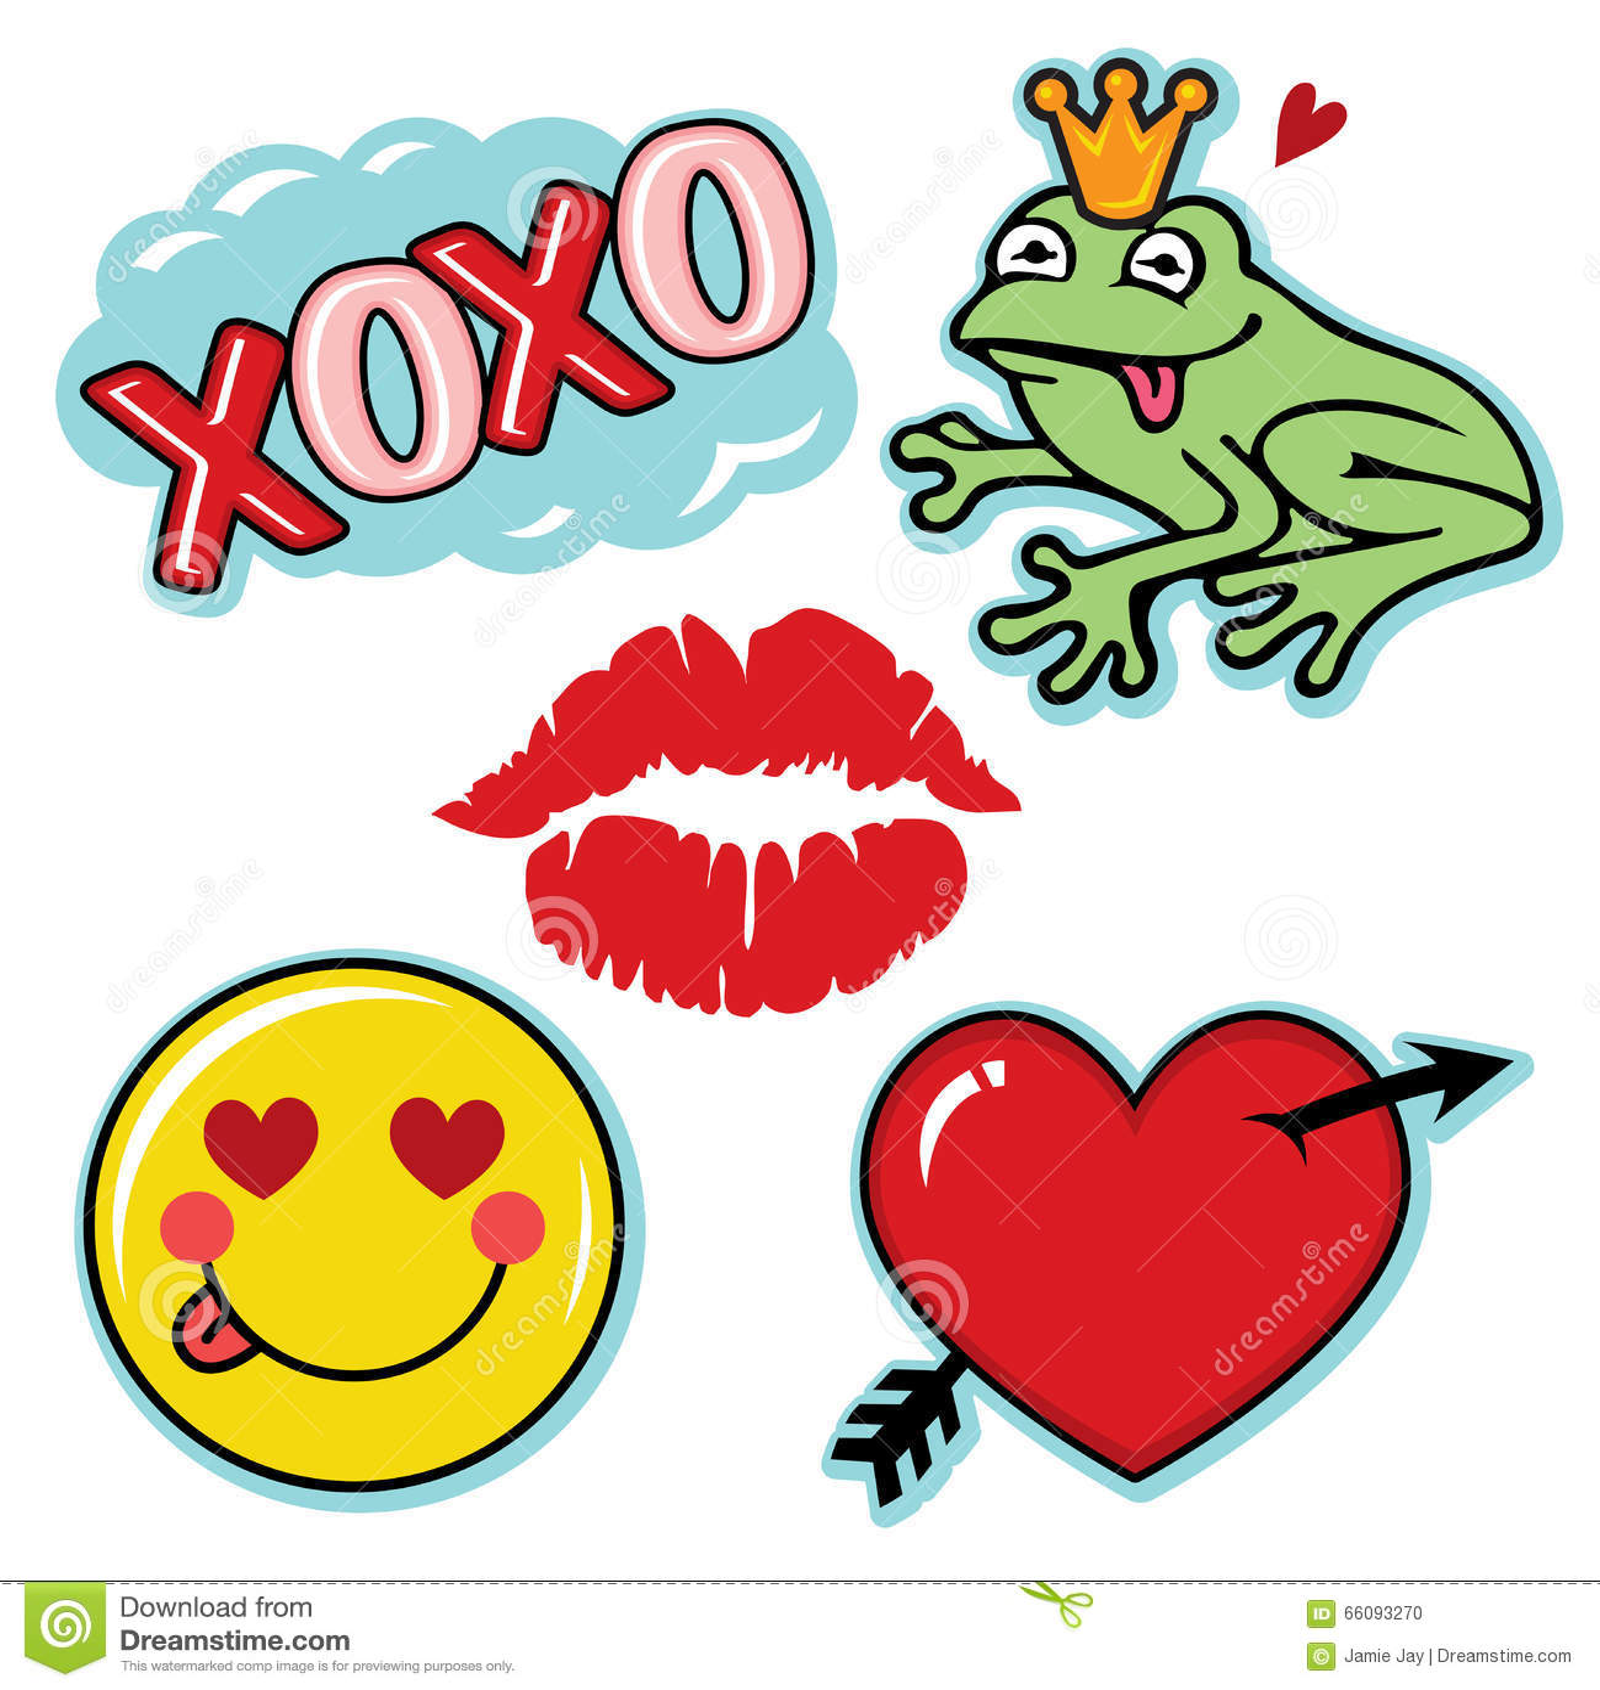 Valentine Fresh And Fun Love Icon Set Stock Vector - Illustration of